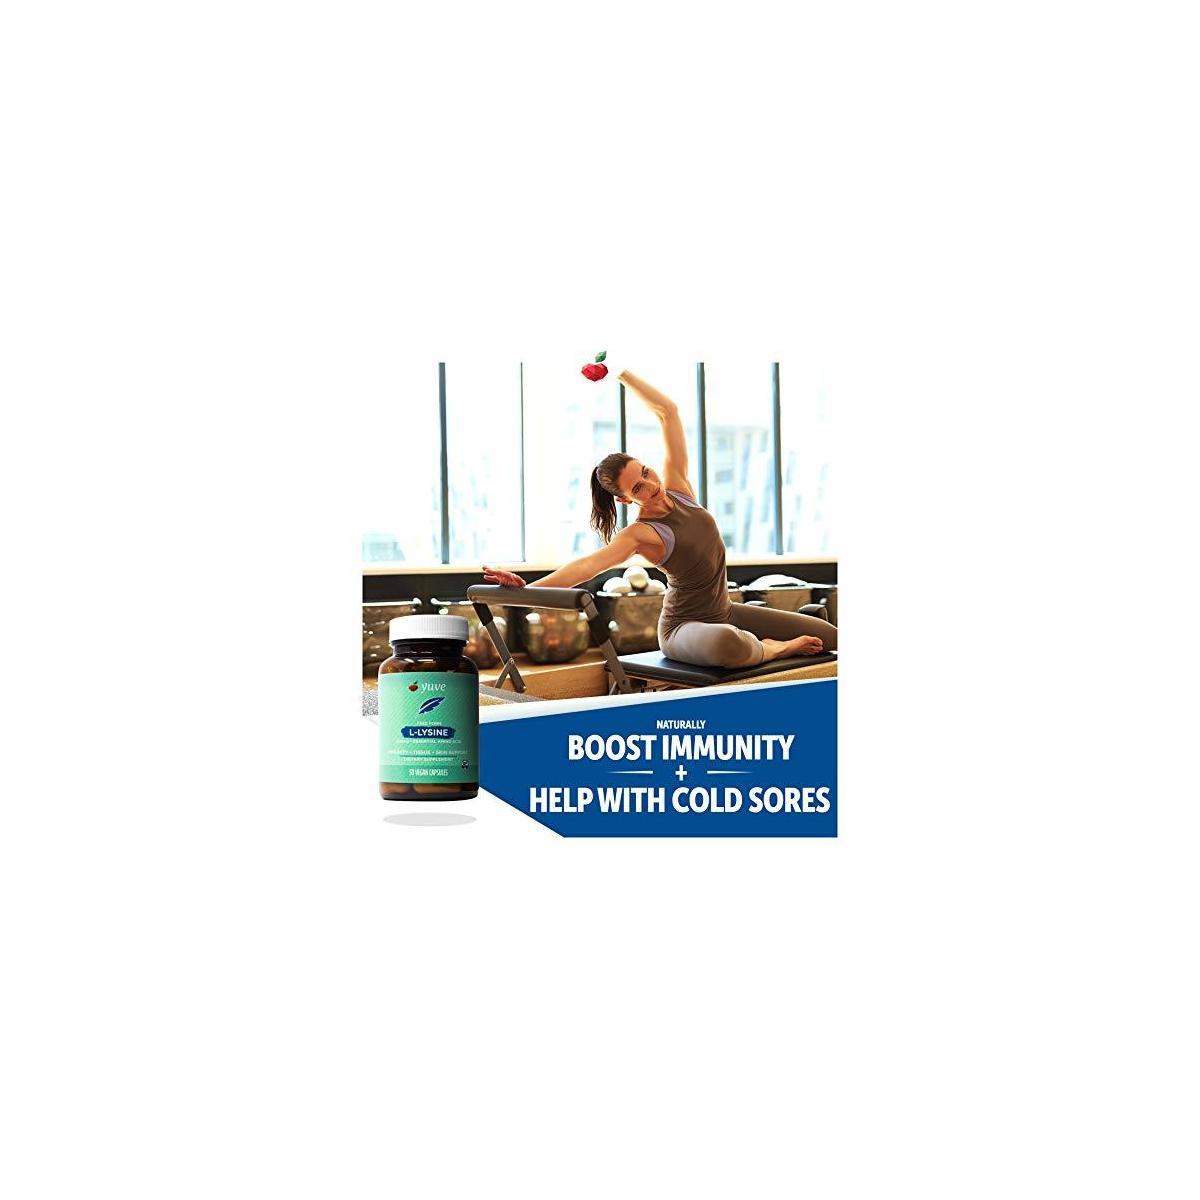 Yuve L-Lysine 500 mg Essential Amino Acid - Immune, Cold Sores & Collagen Synthesis Support - Maintain Healthy Arginine Levels & Optimal Calcium Absorption - Vegan, Gelatin-Free, Non-GMO - 50 Capsules